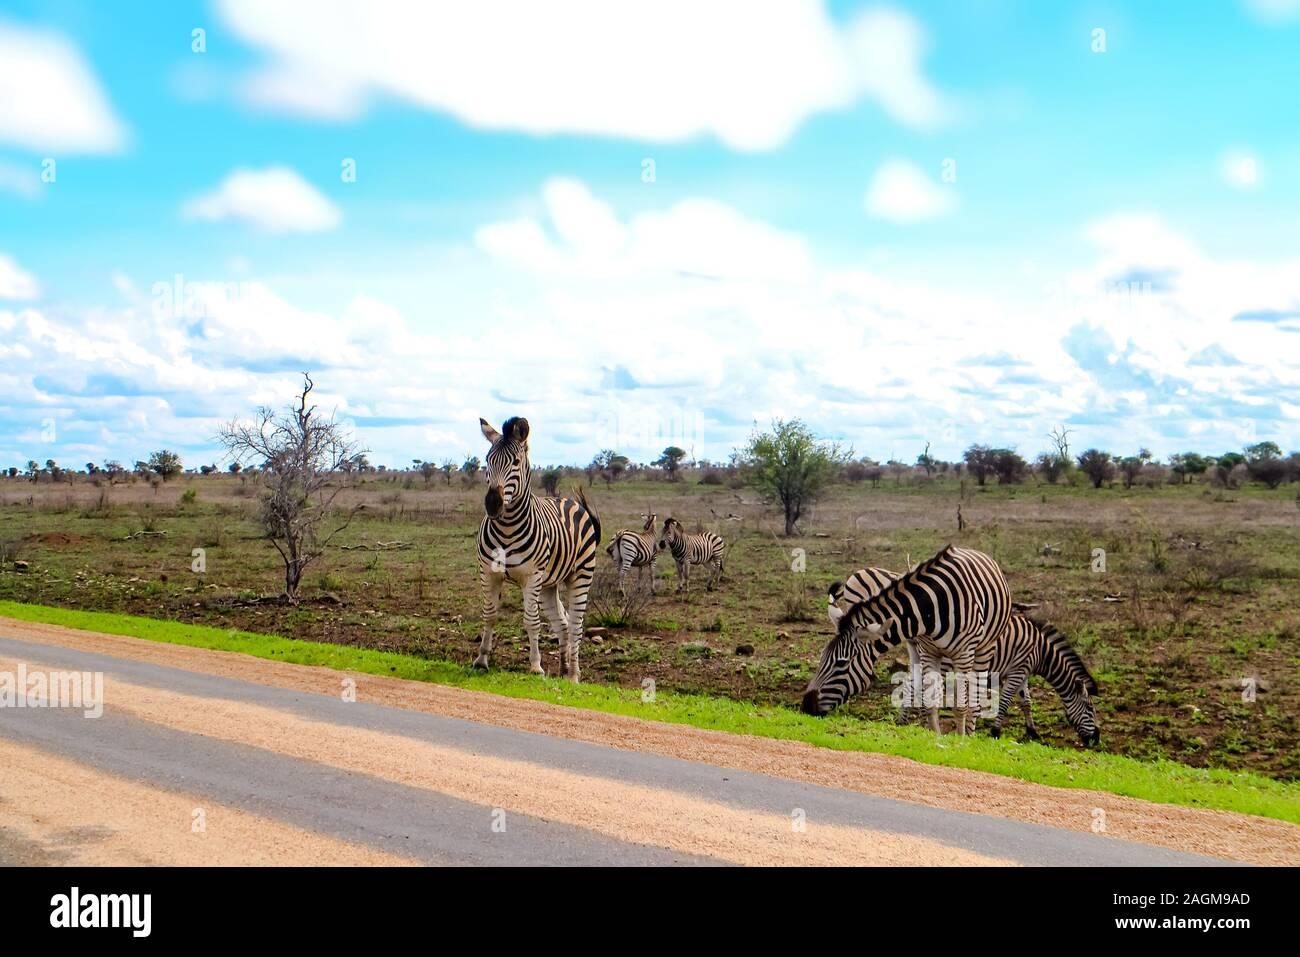 a-zebra-from-a-grazing-herd-is-crossing-